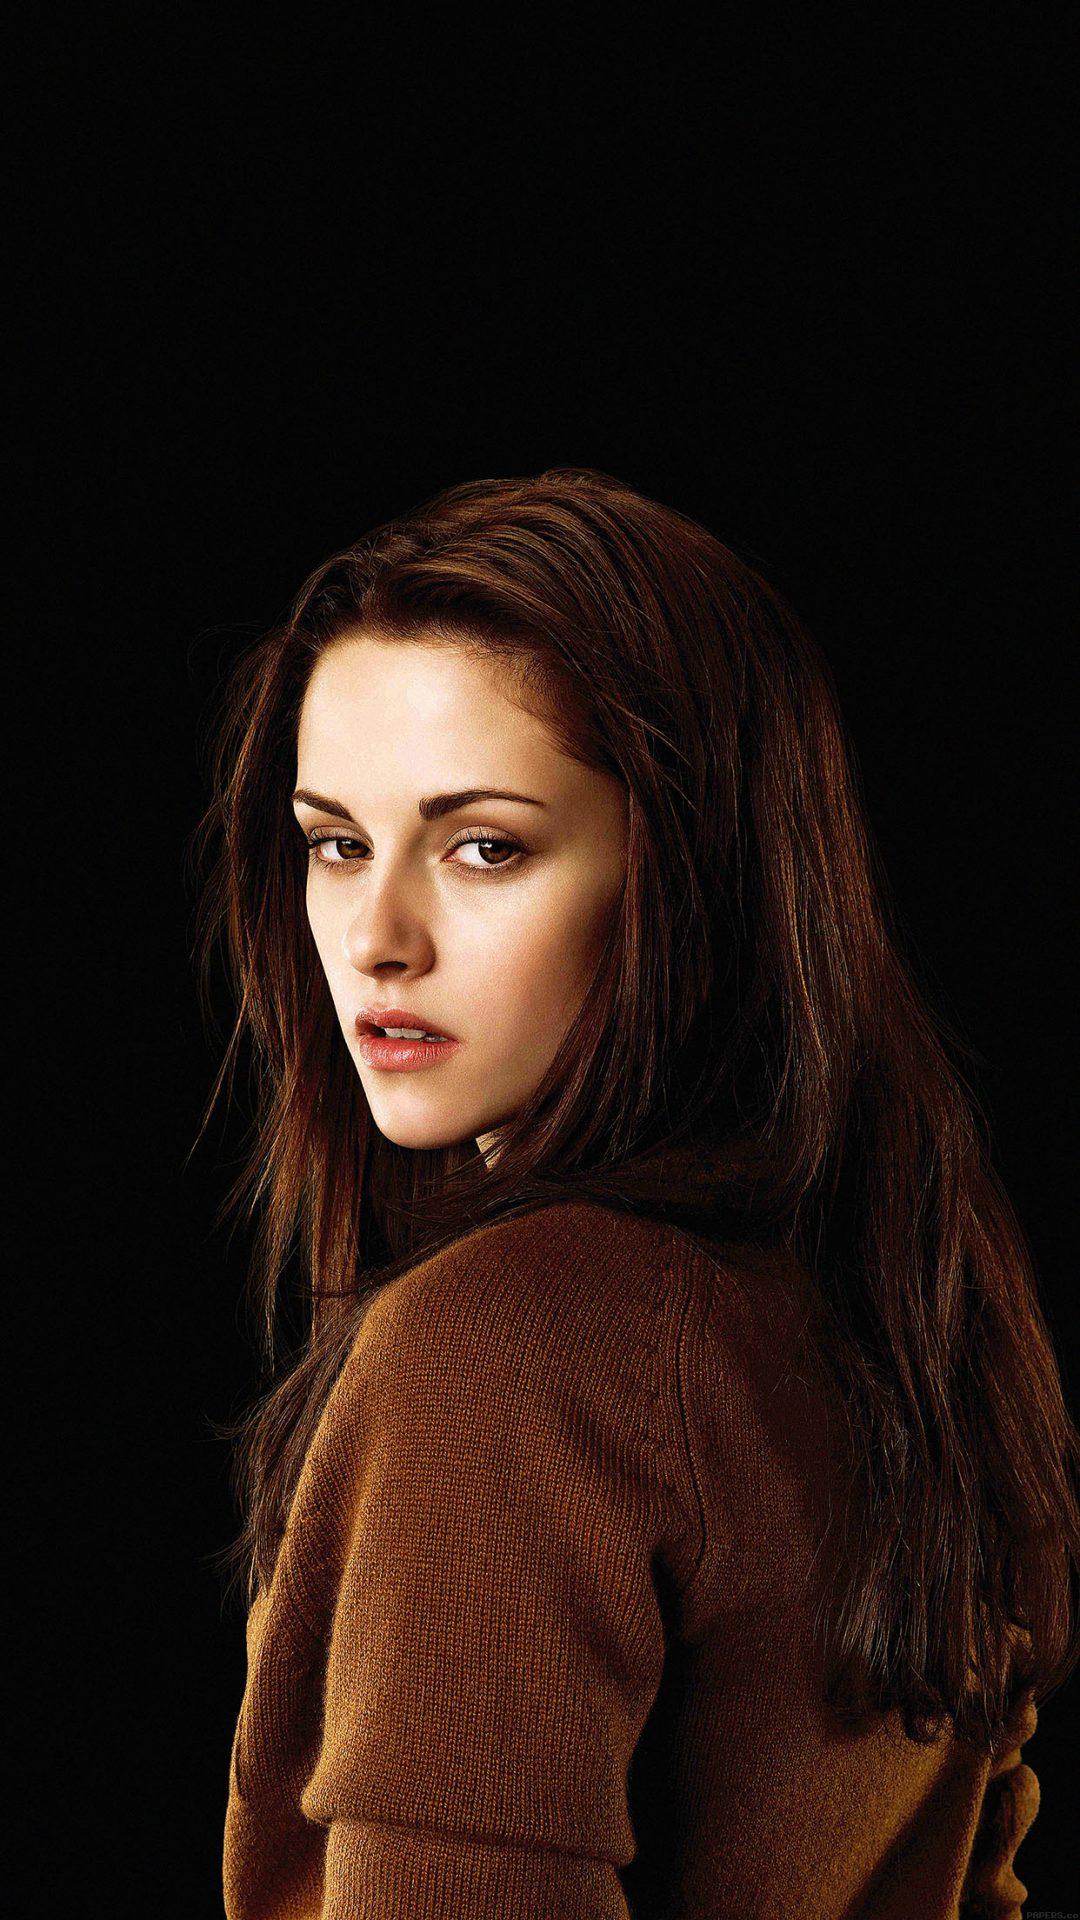 Wallpaper Kristen Stewart Twilight Bella Wwan Film